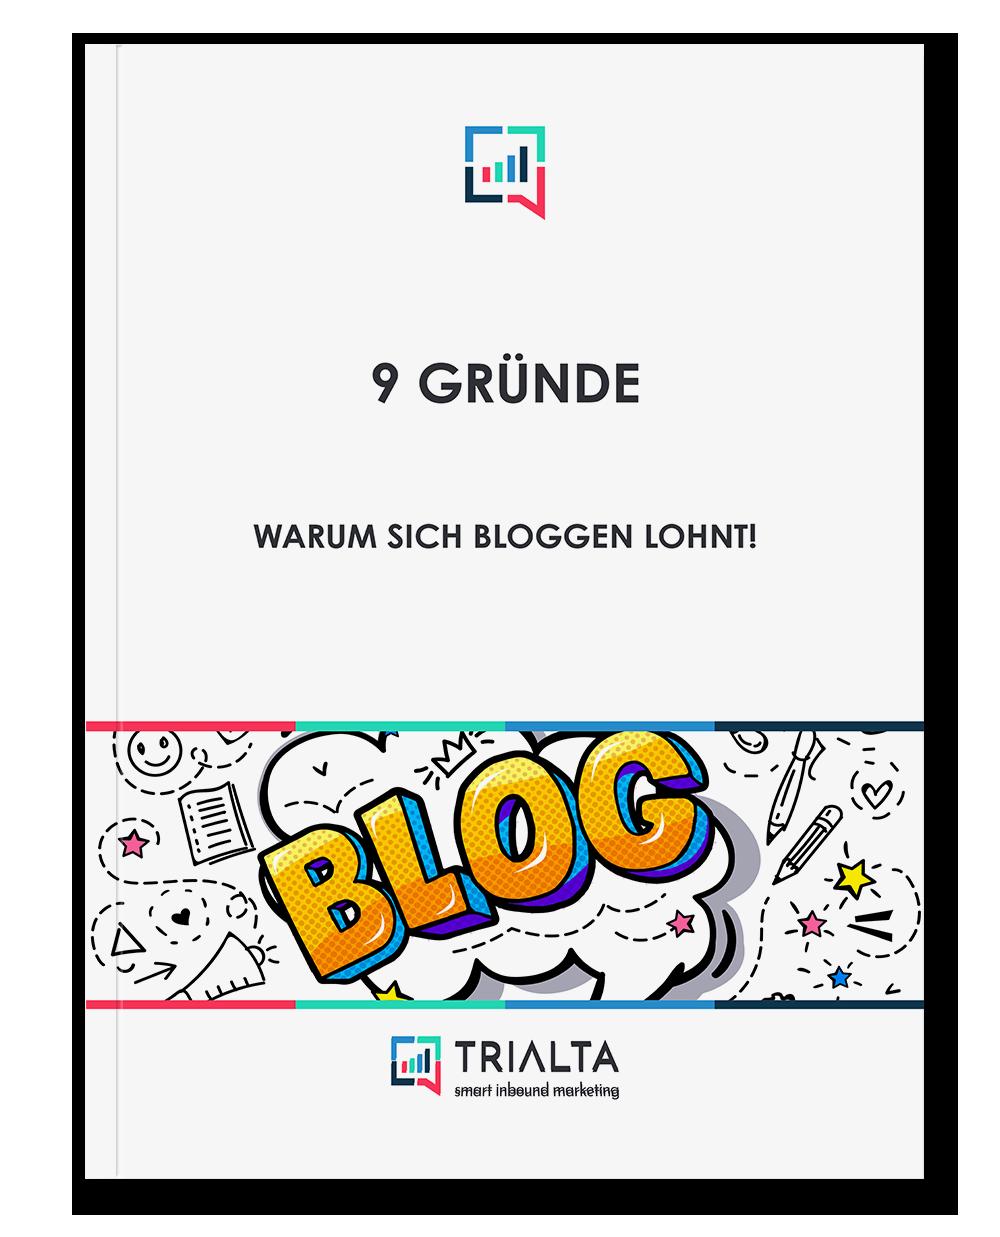 TRIALTA - Inbound-Marketing-Superkraft